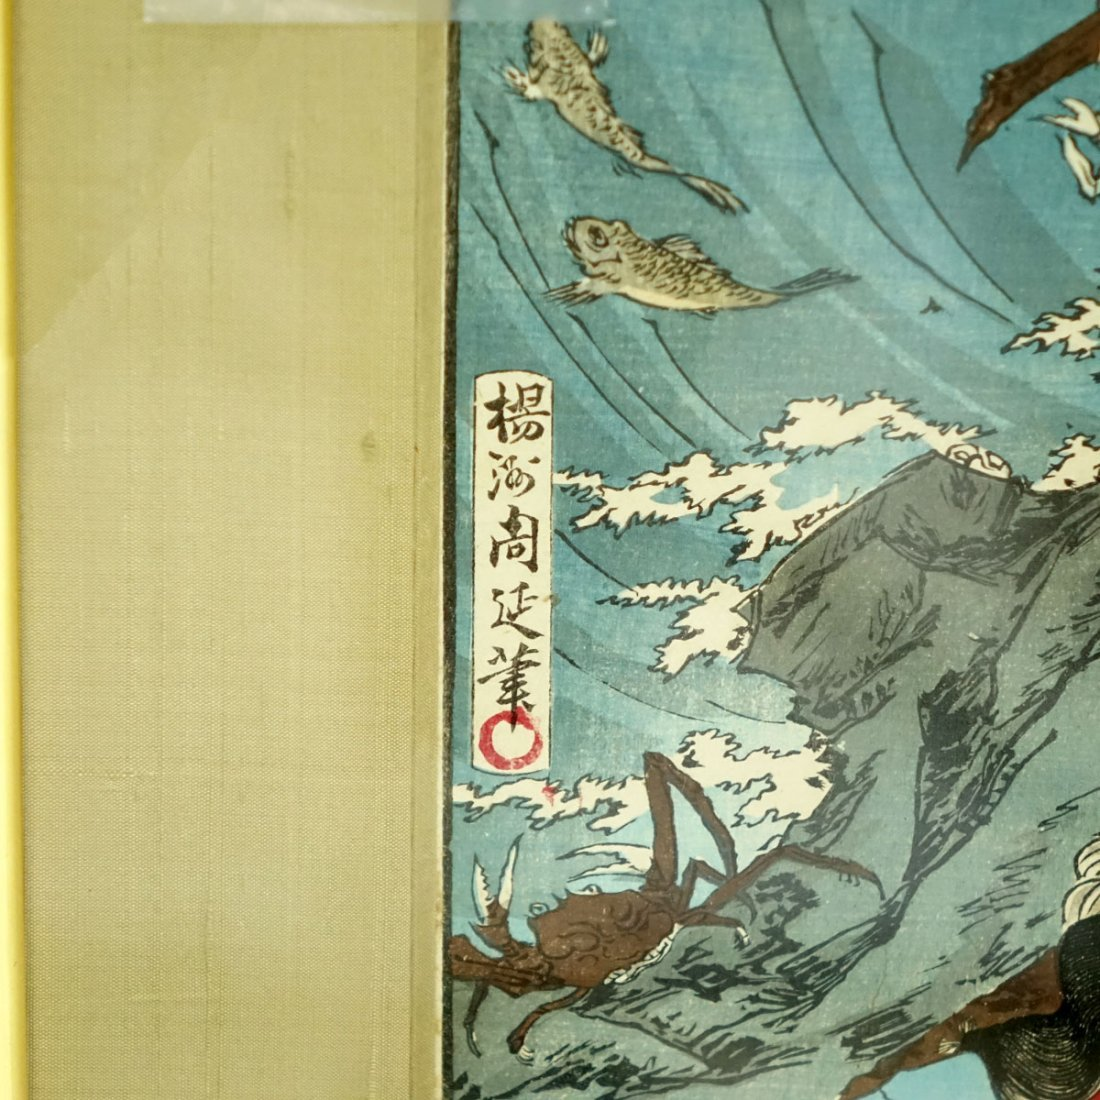 Japanese Woodblock Prints - 8